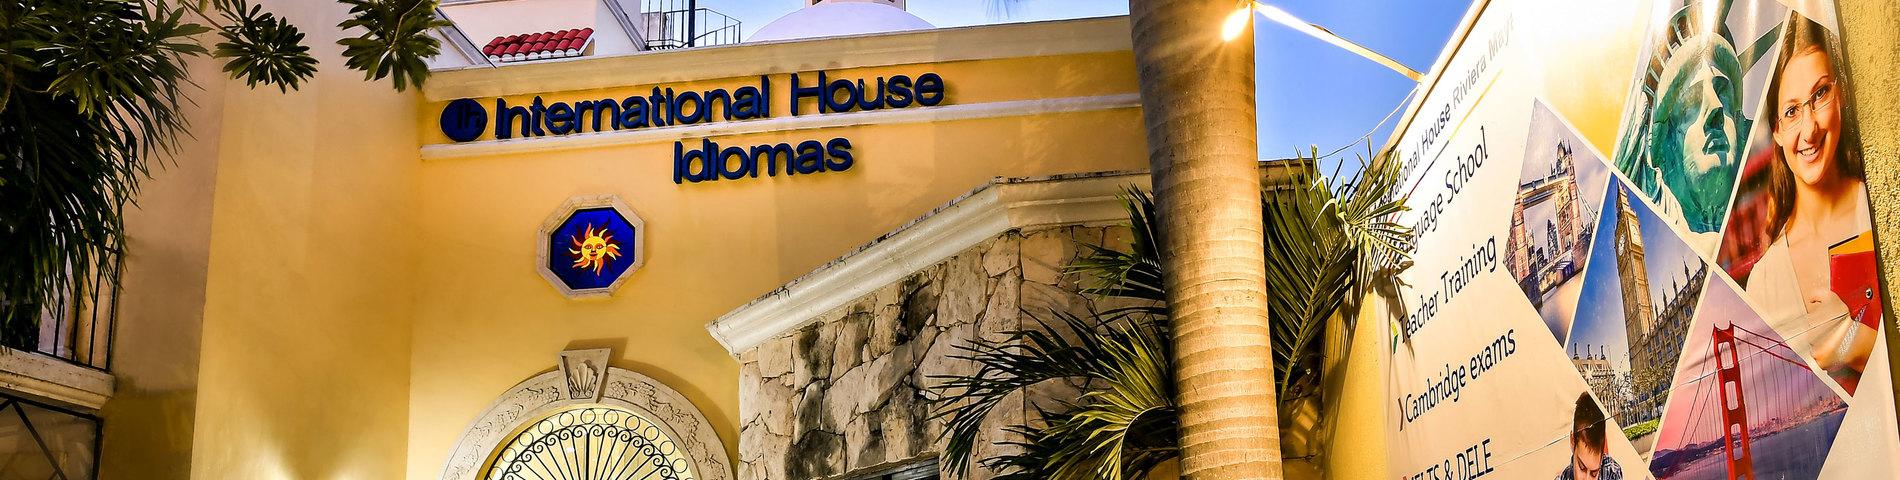 Imatge 1 de l'escola International House - Riviera Maya